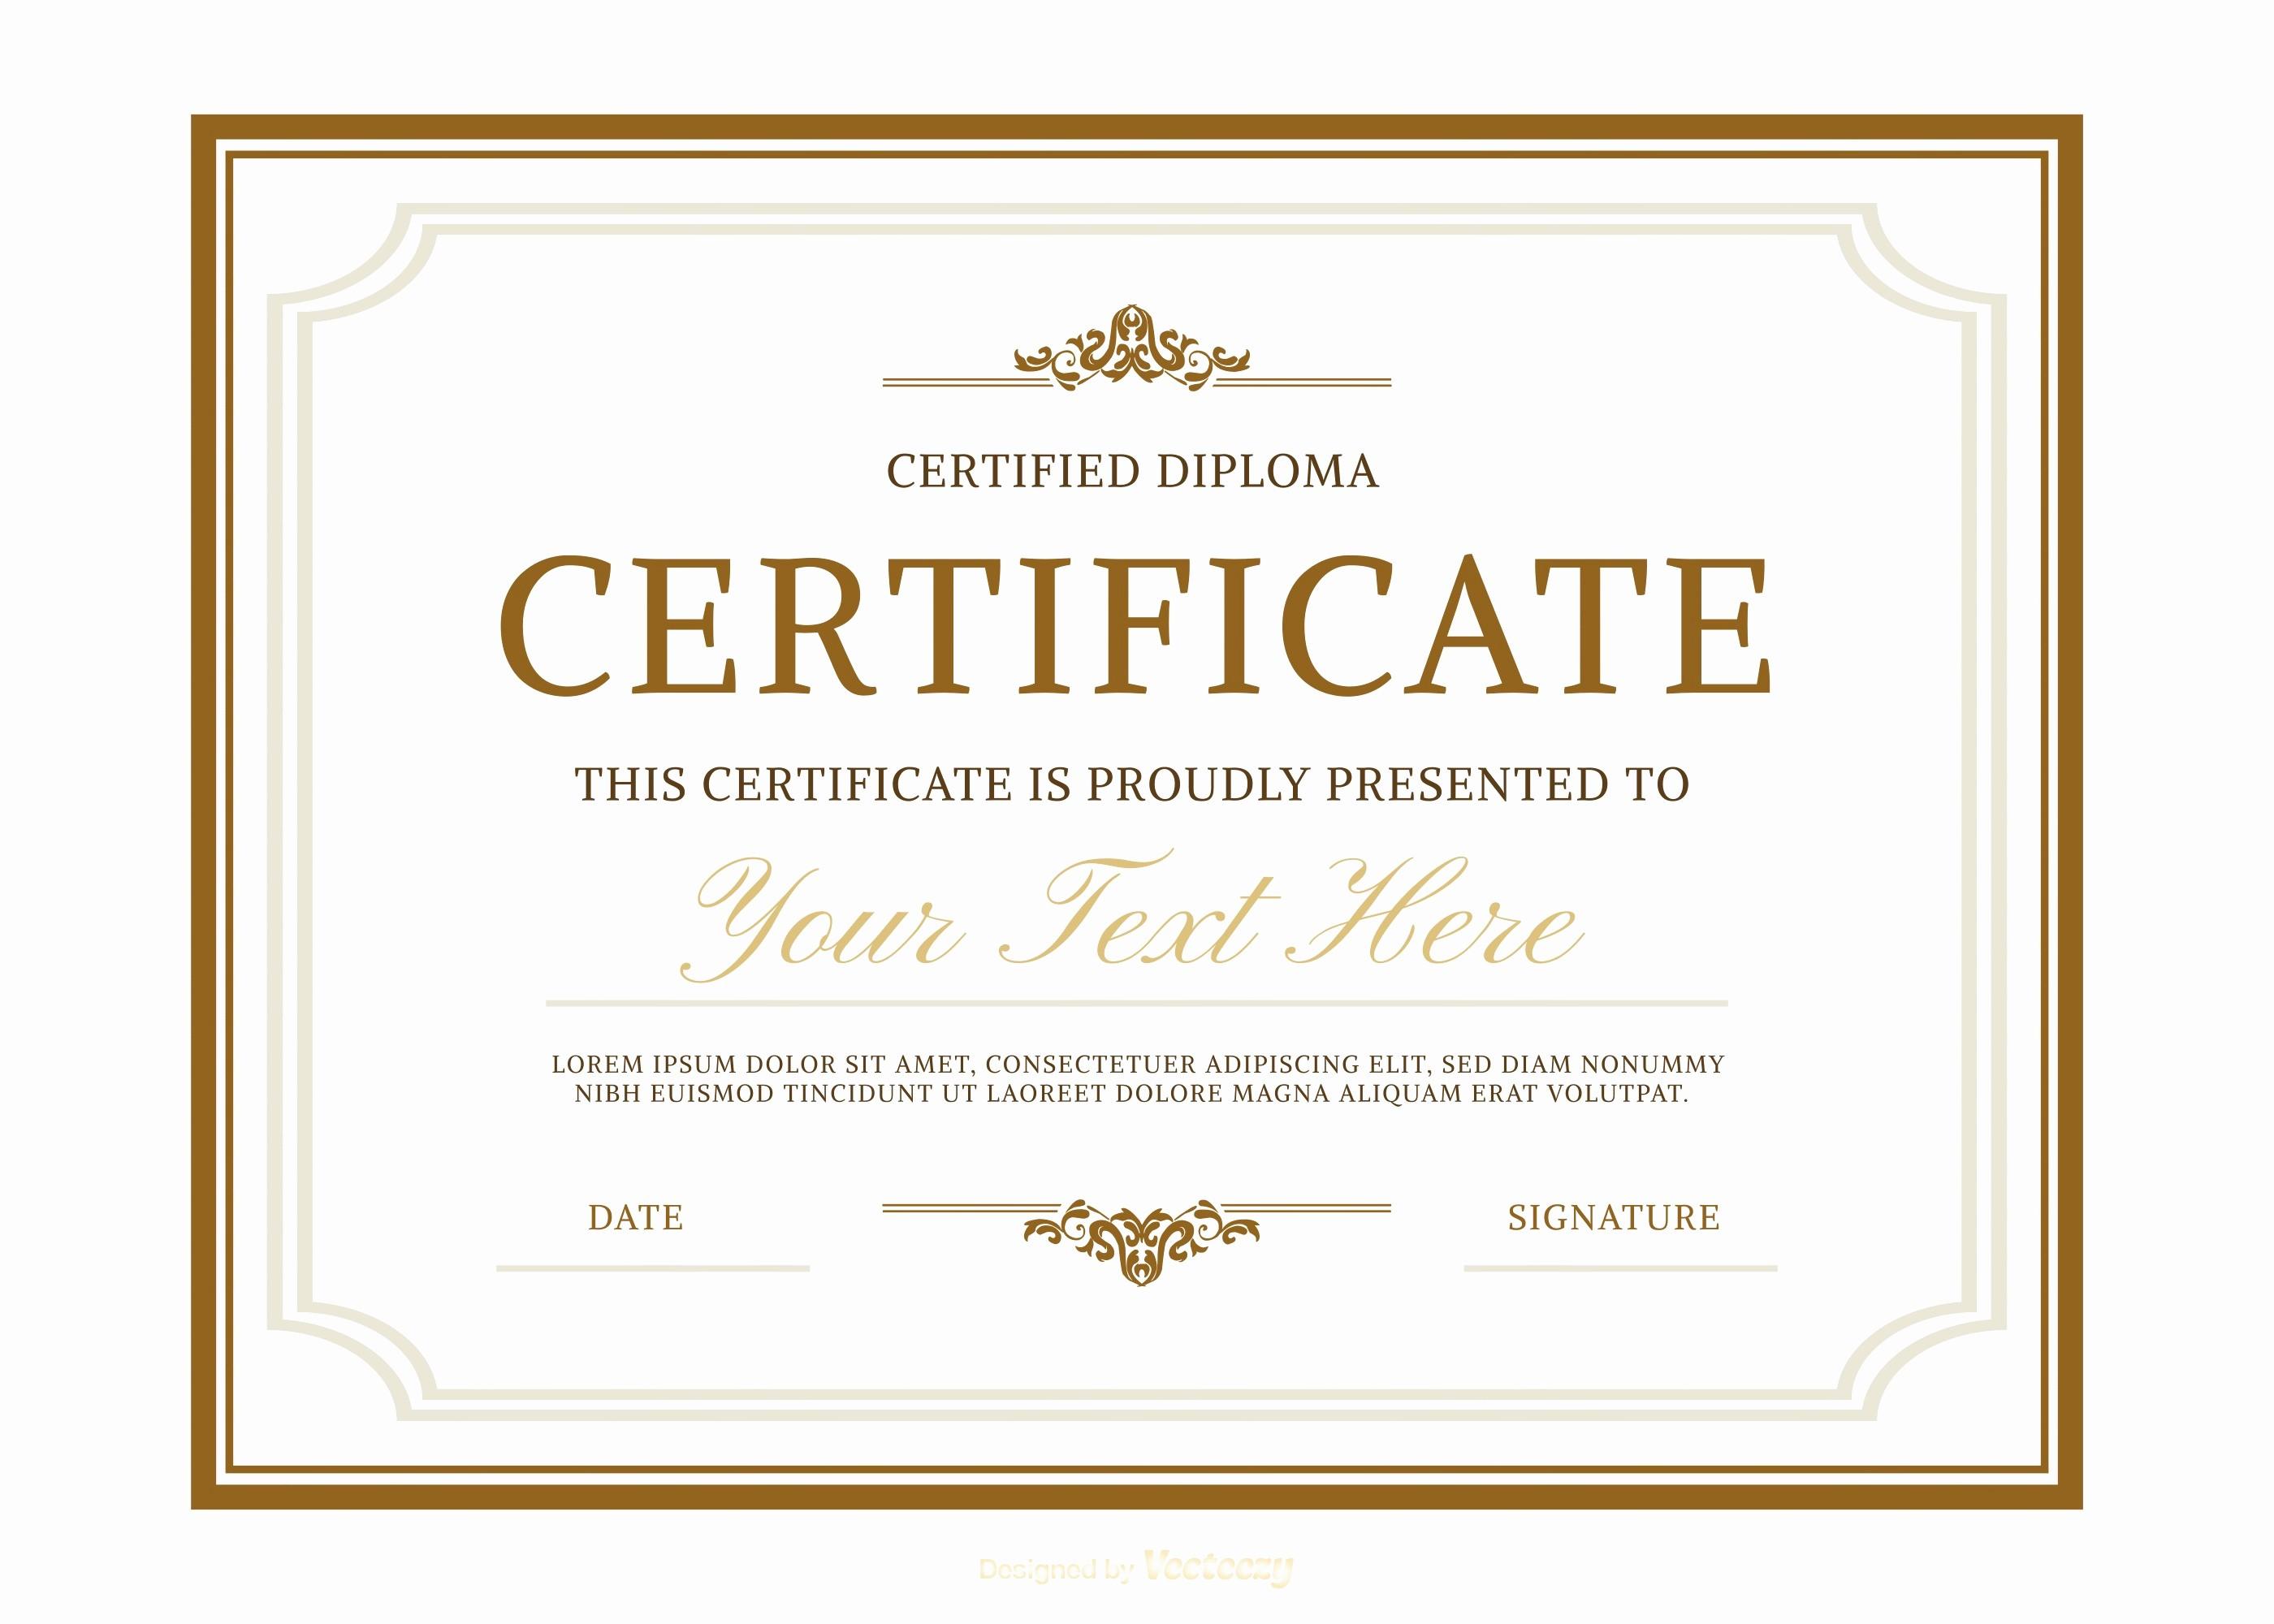 Free Printable Graduation Certificate Templates Fresh Diplomas Free Vector Art 1099 Free Downloads